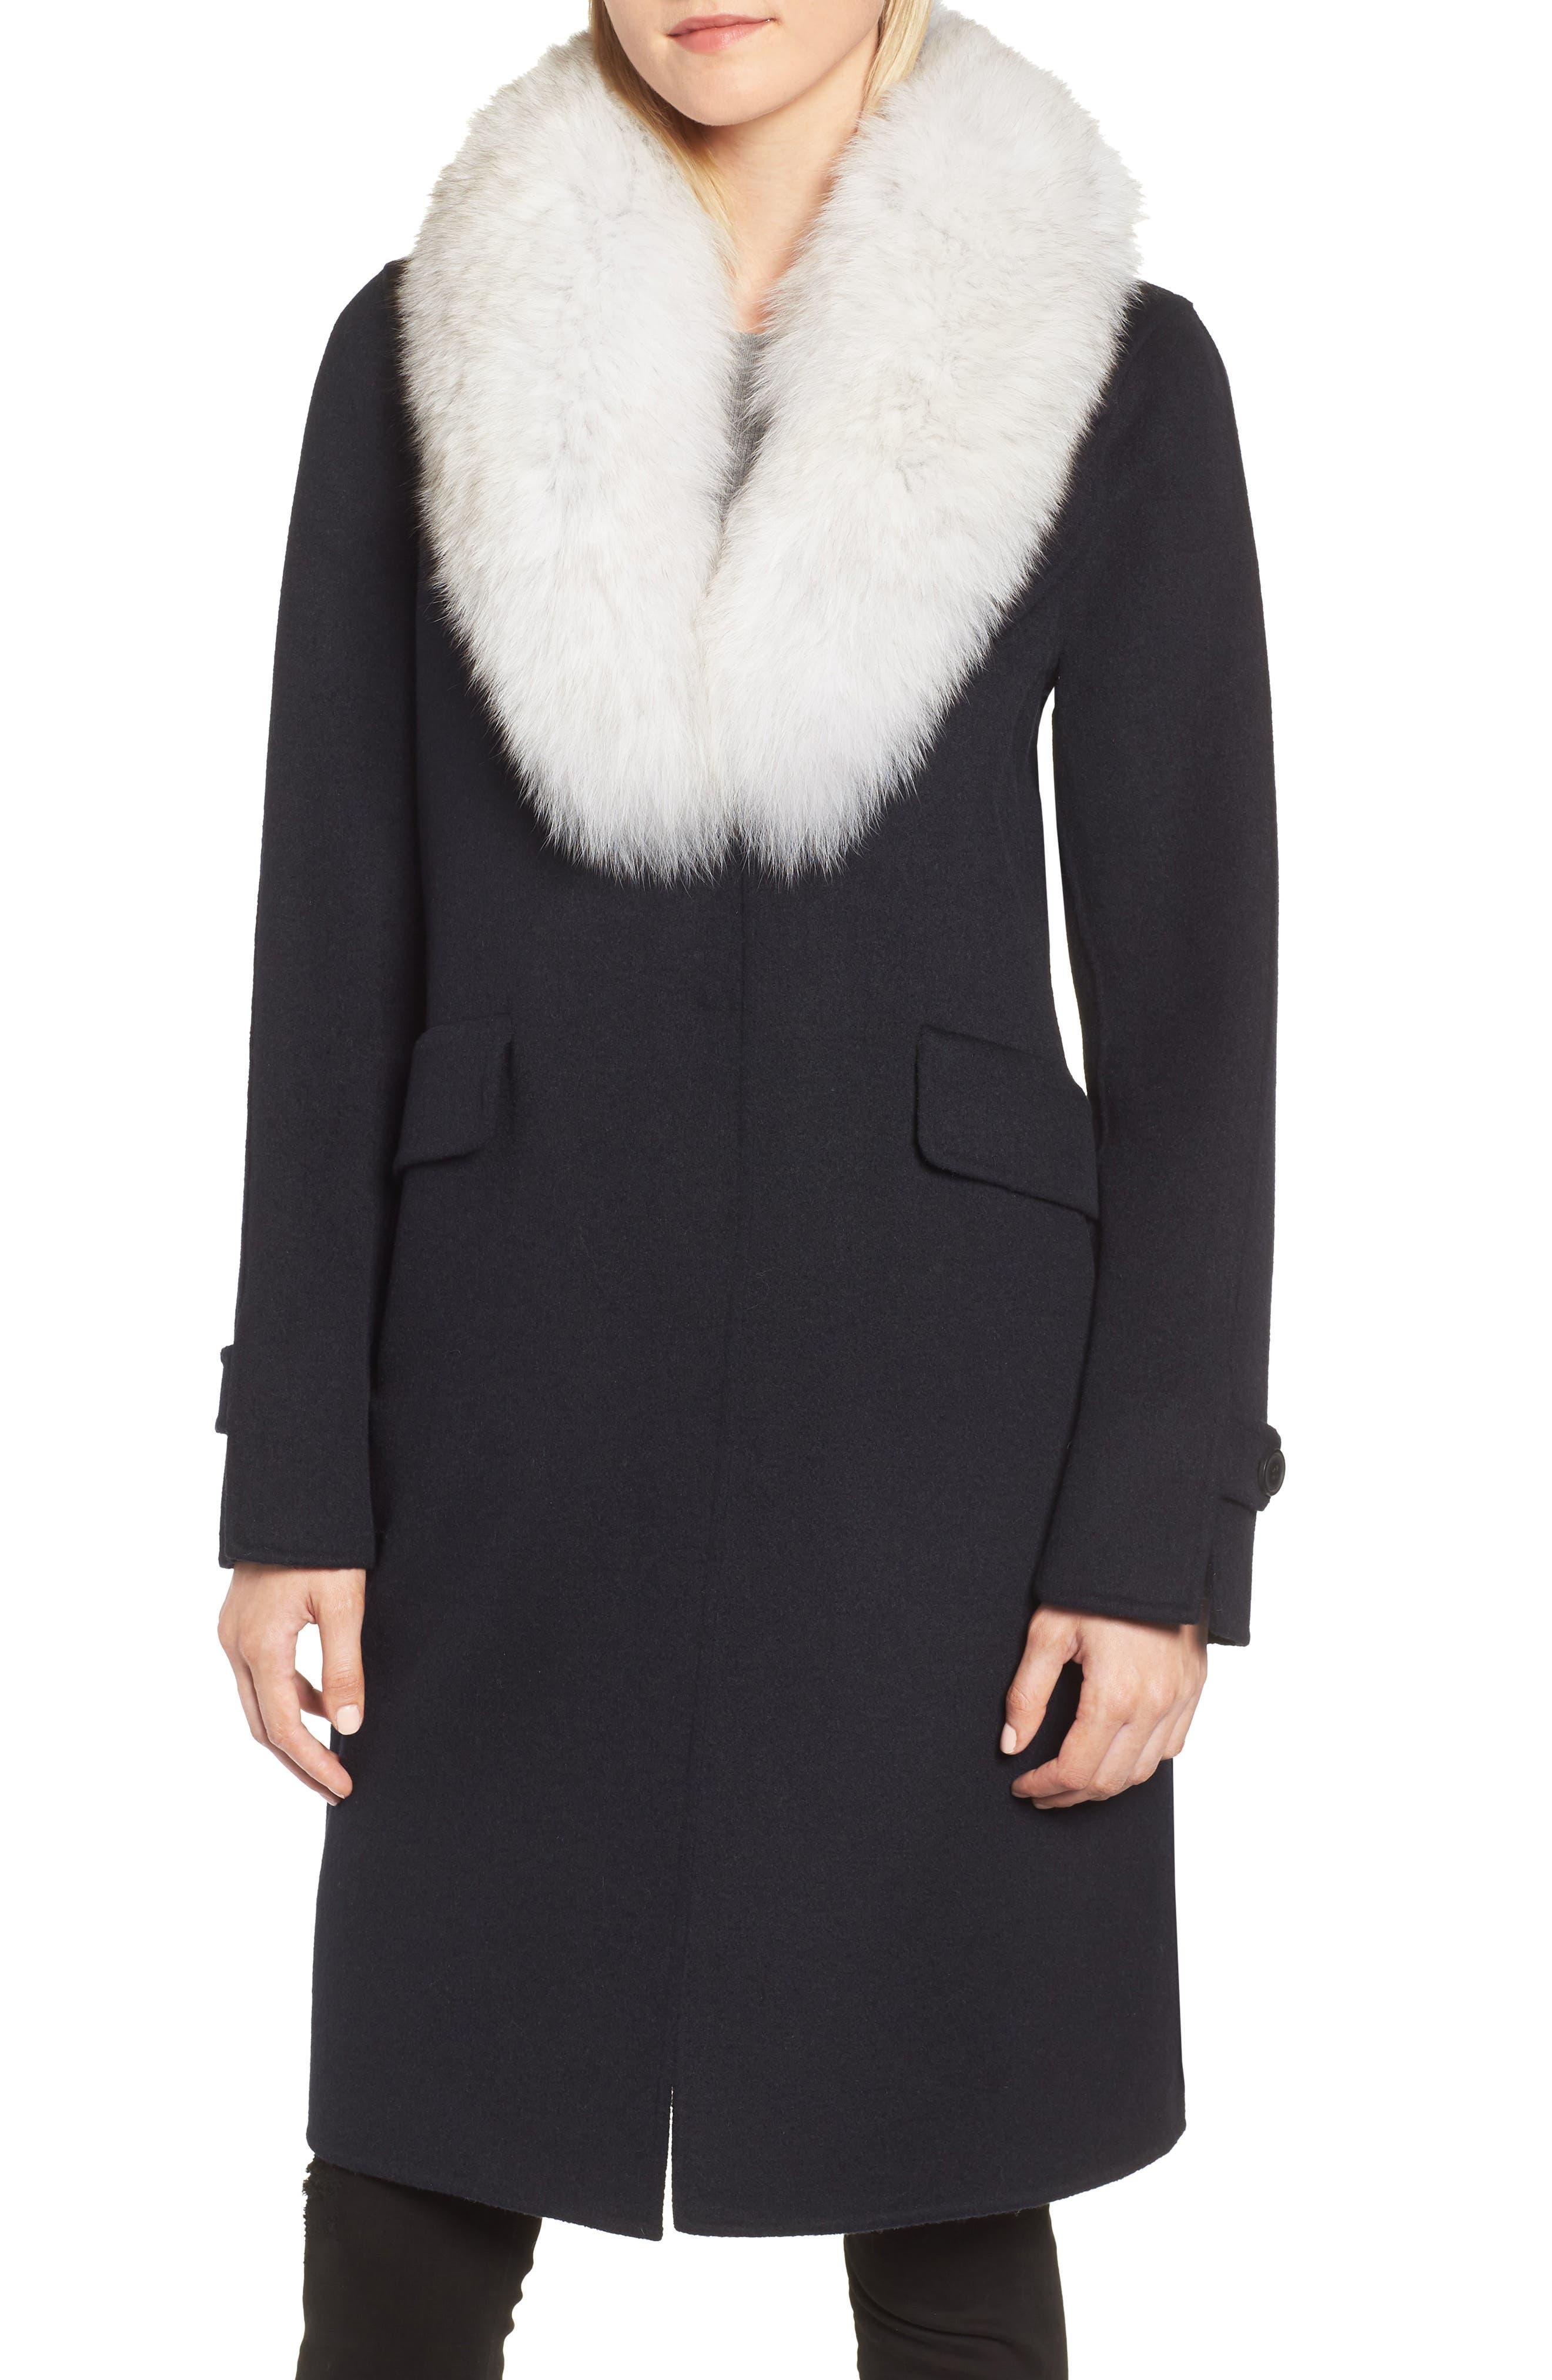 Wool Blend Reefer Coat with Genuine Fox Fur Trim, Main, color, NAVY